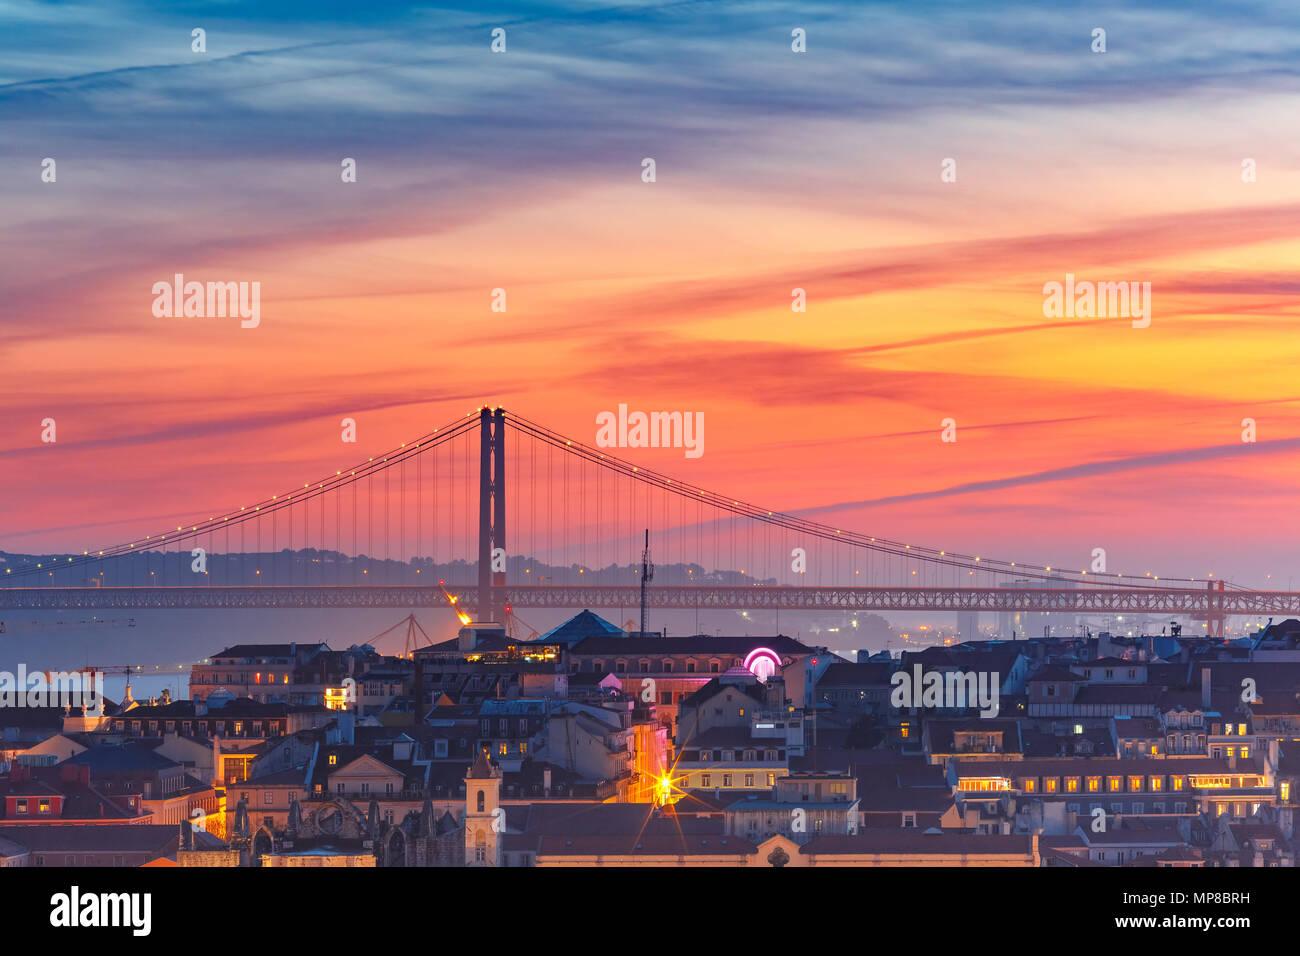 Centro histórico de Lisboa al atardecer, Portugal Foto de stock